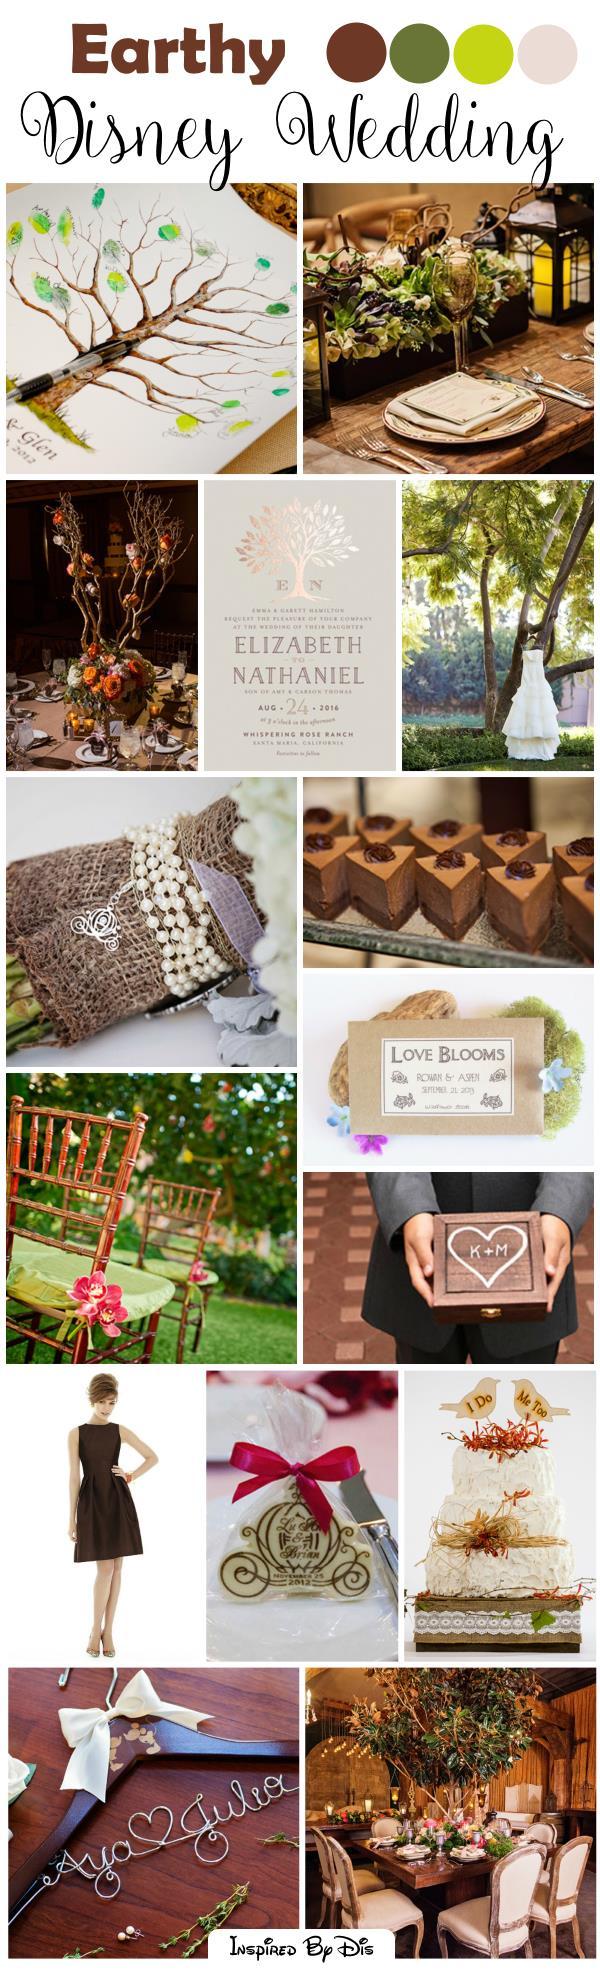 Natural, Earthy Disney Wedding Inspiration